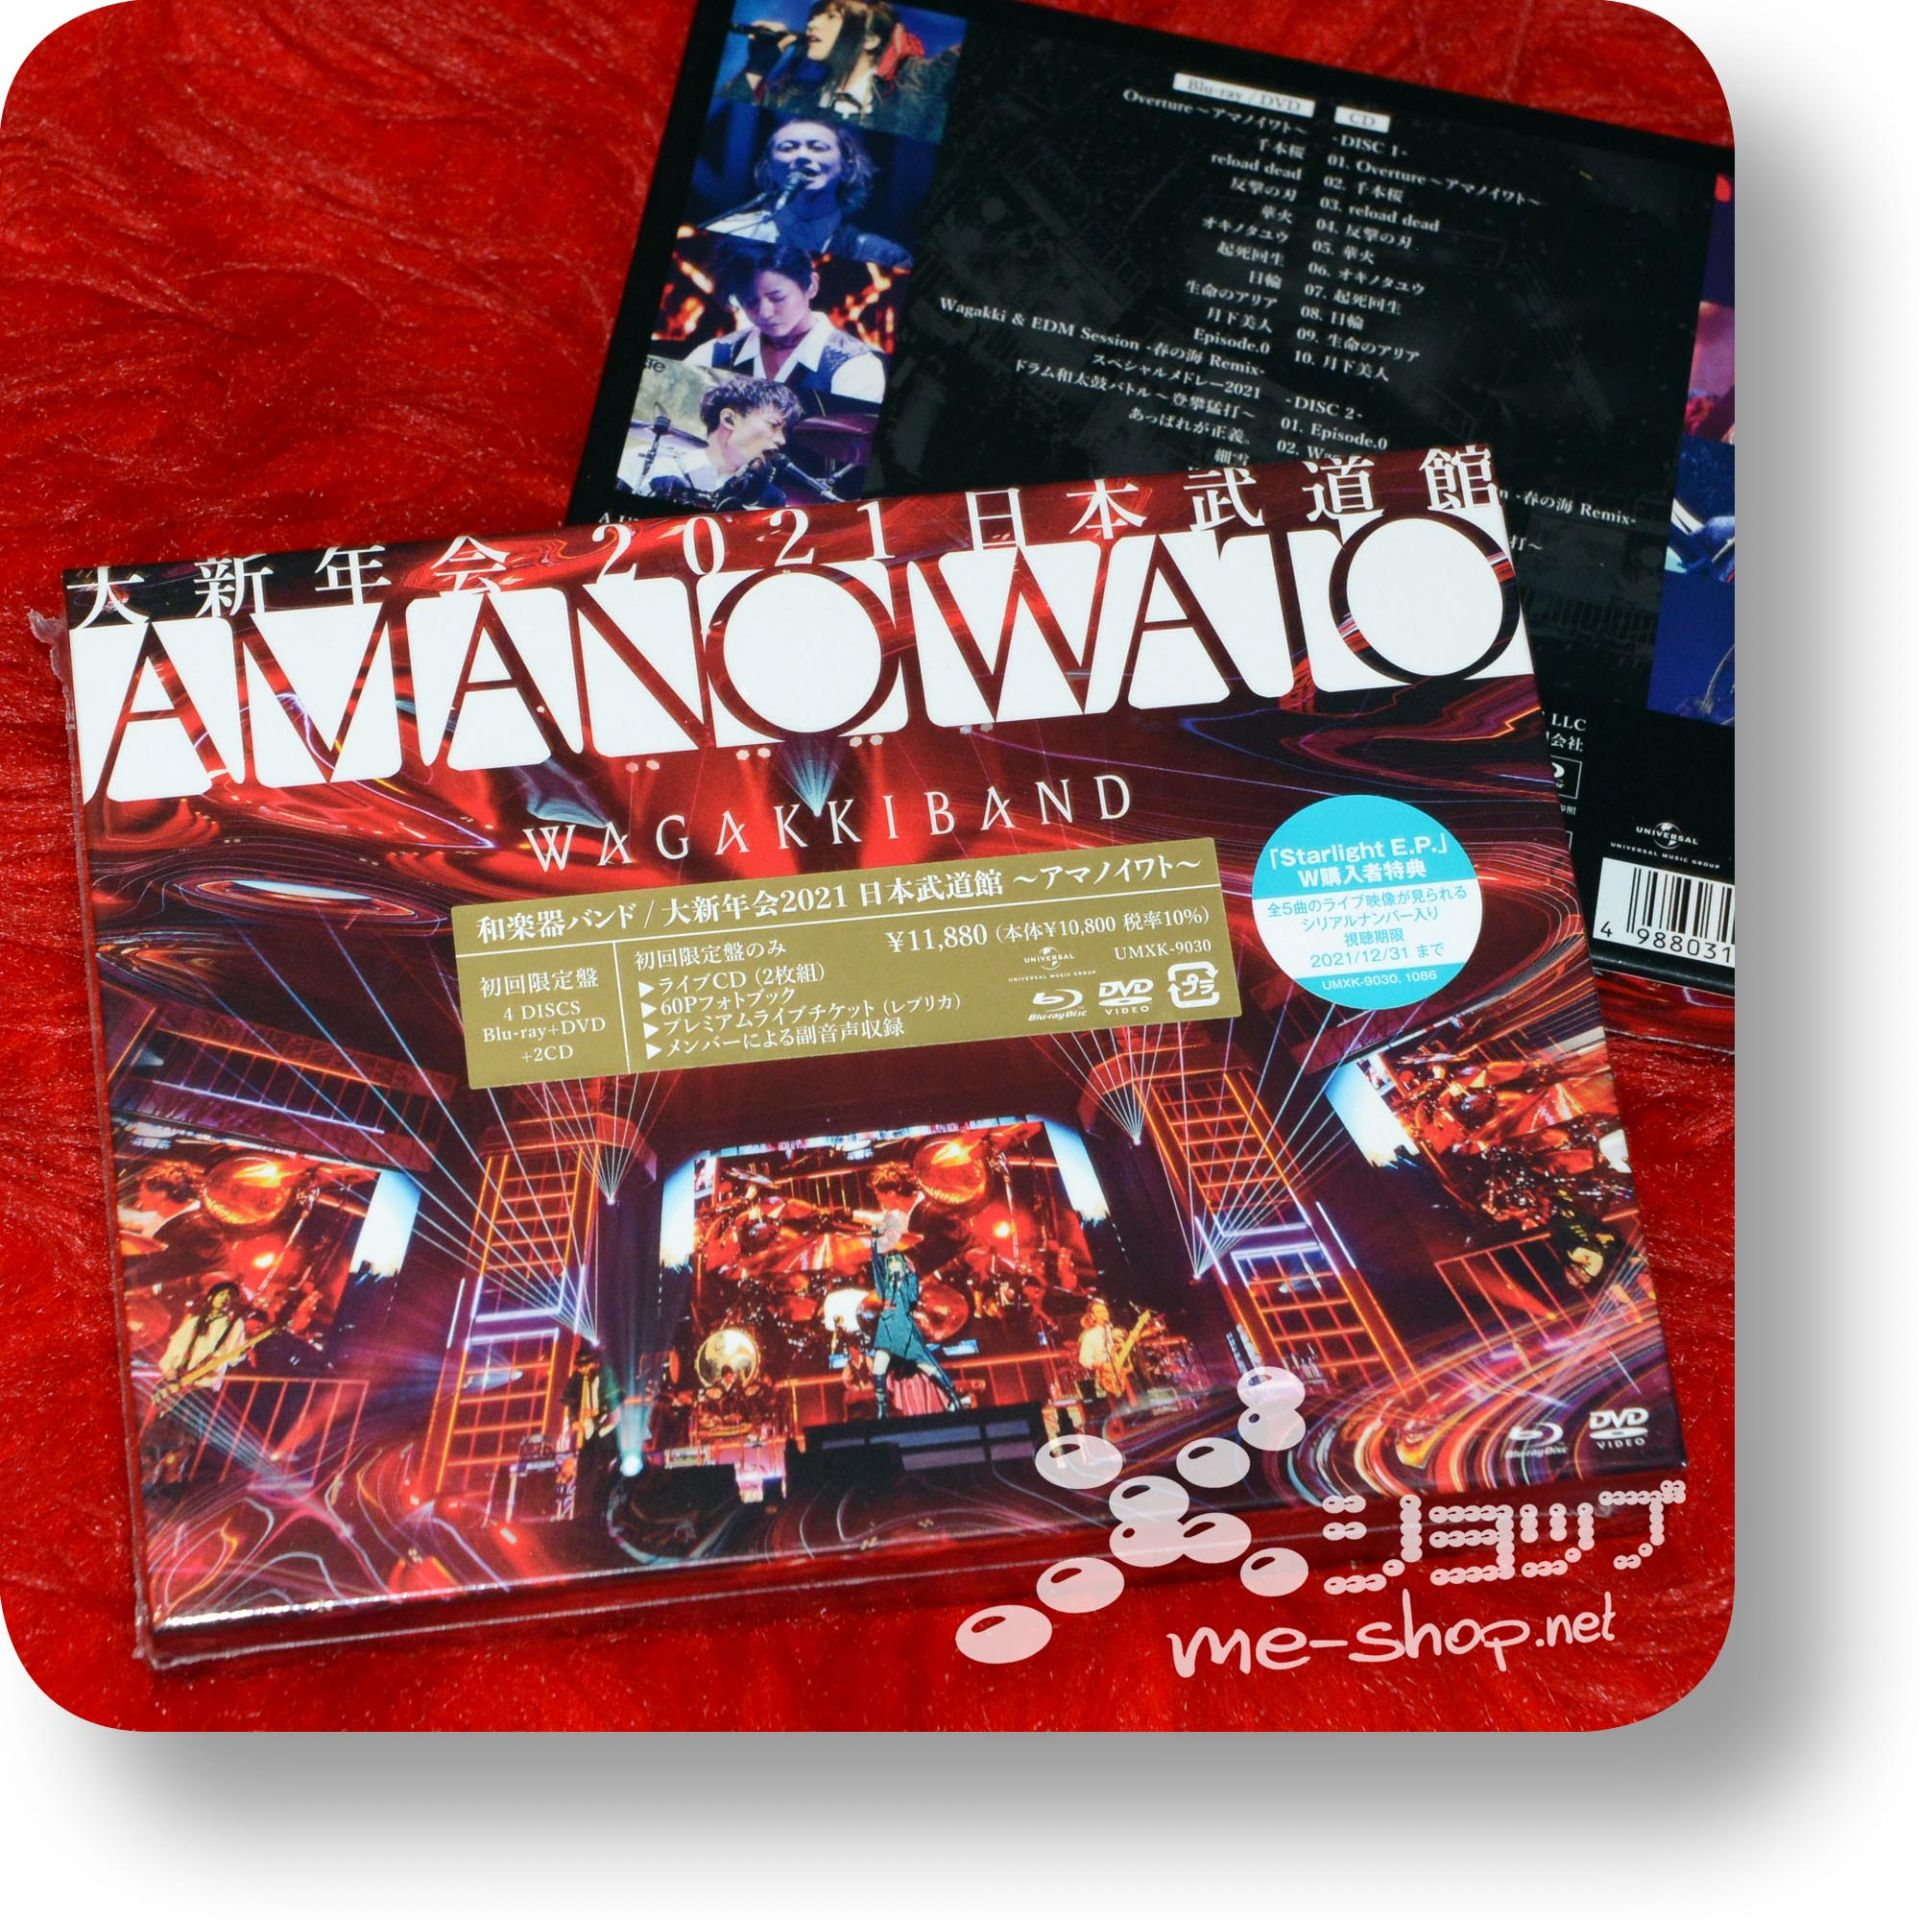 wagakki band amanoiwato box